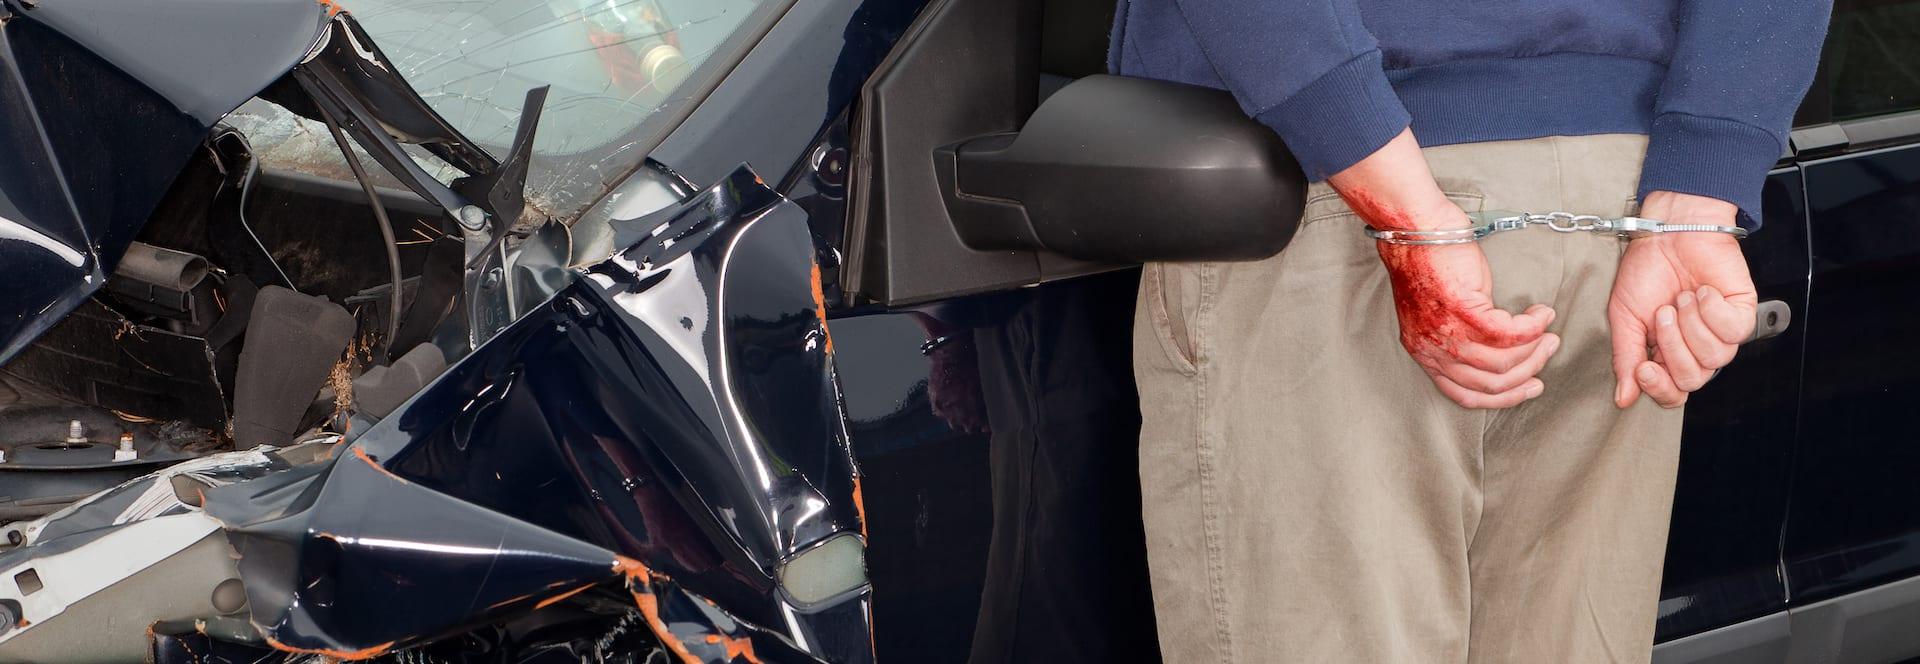 DRUNK DRIVER WHO KILLED GEORGIA WOMAN SENTENCED TO PRISON